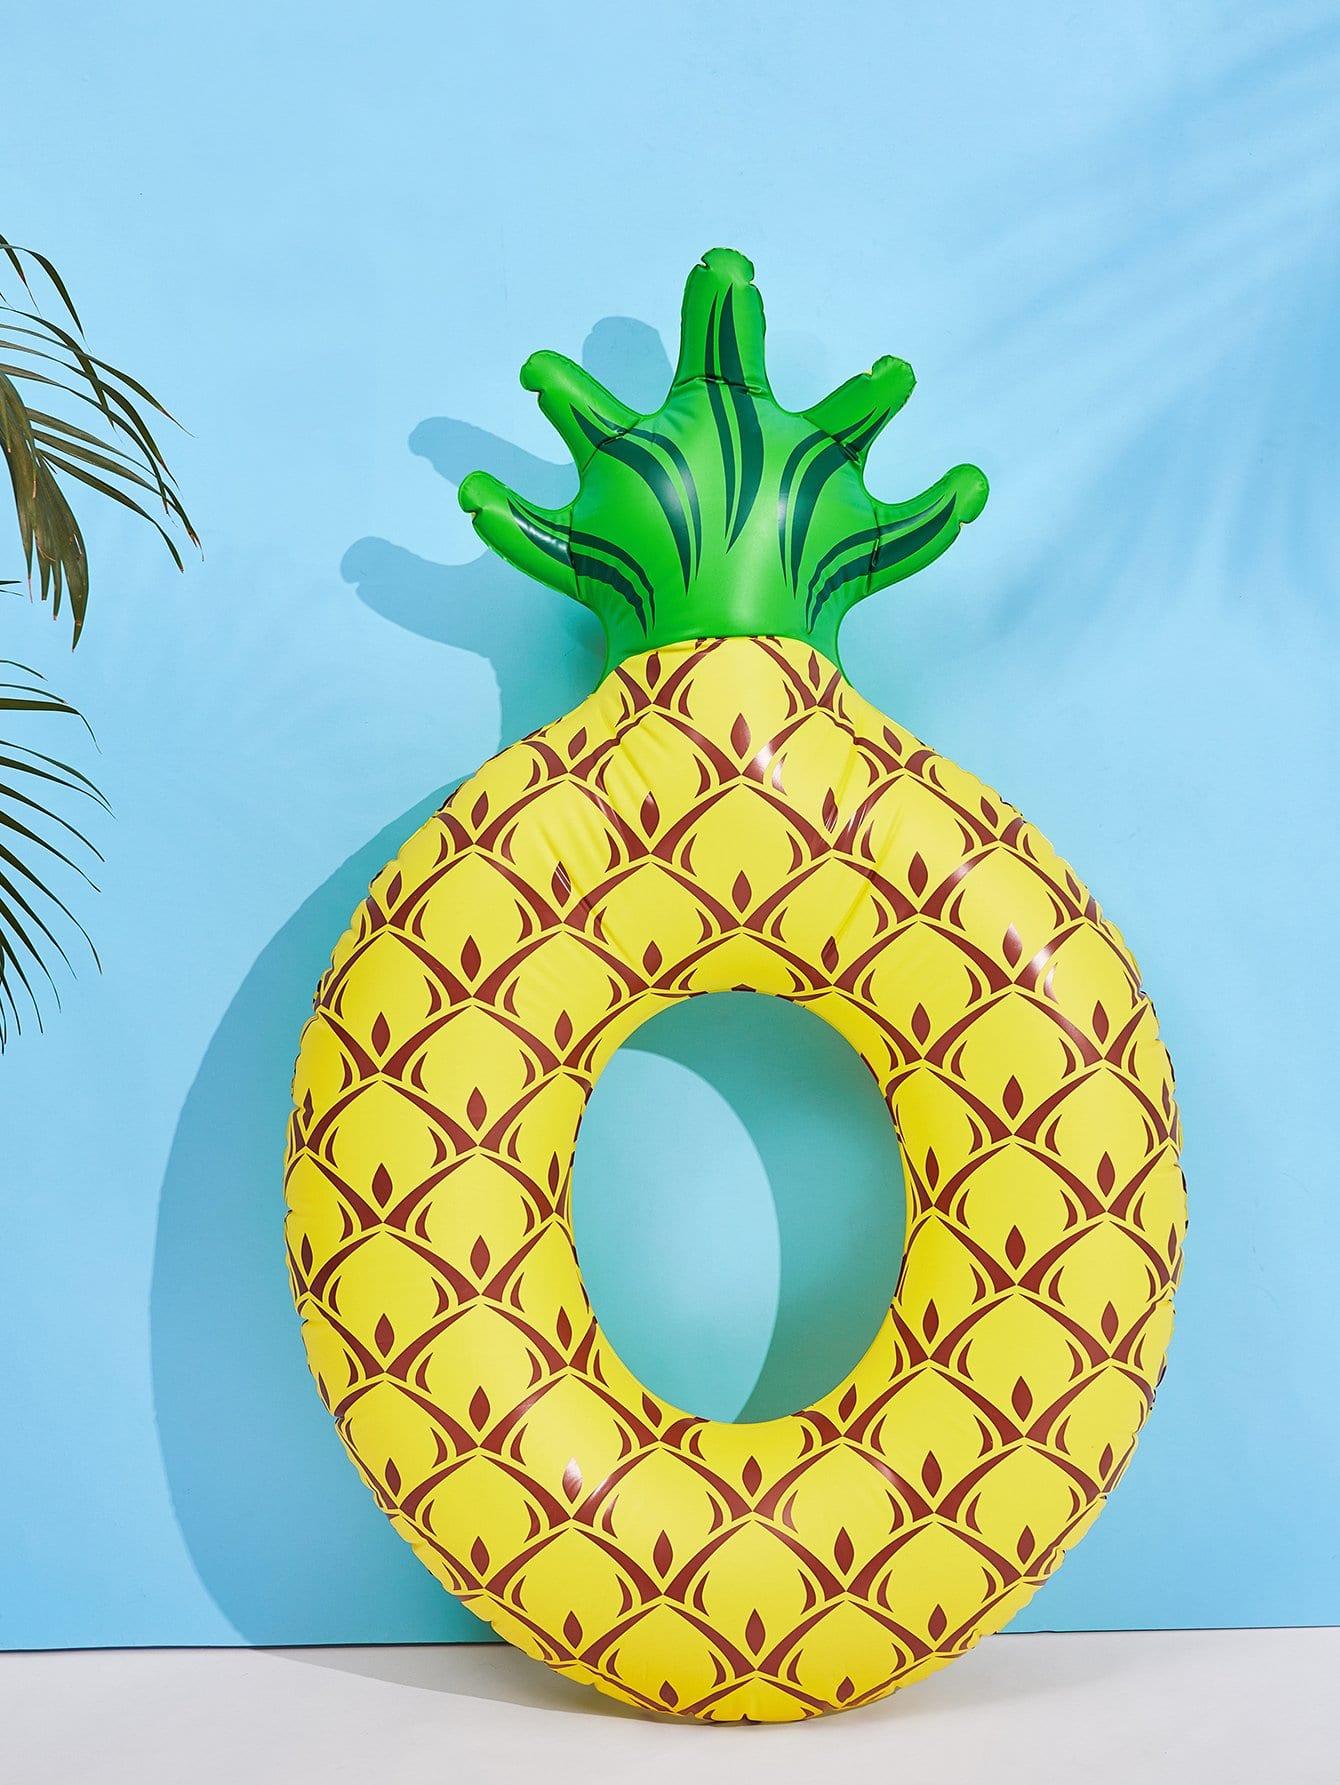 Pineapple Shaped Swi...